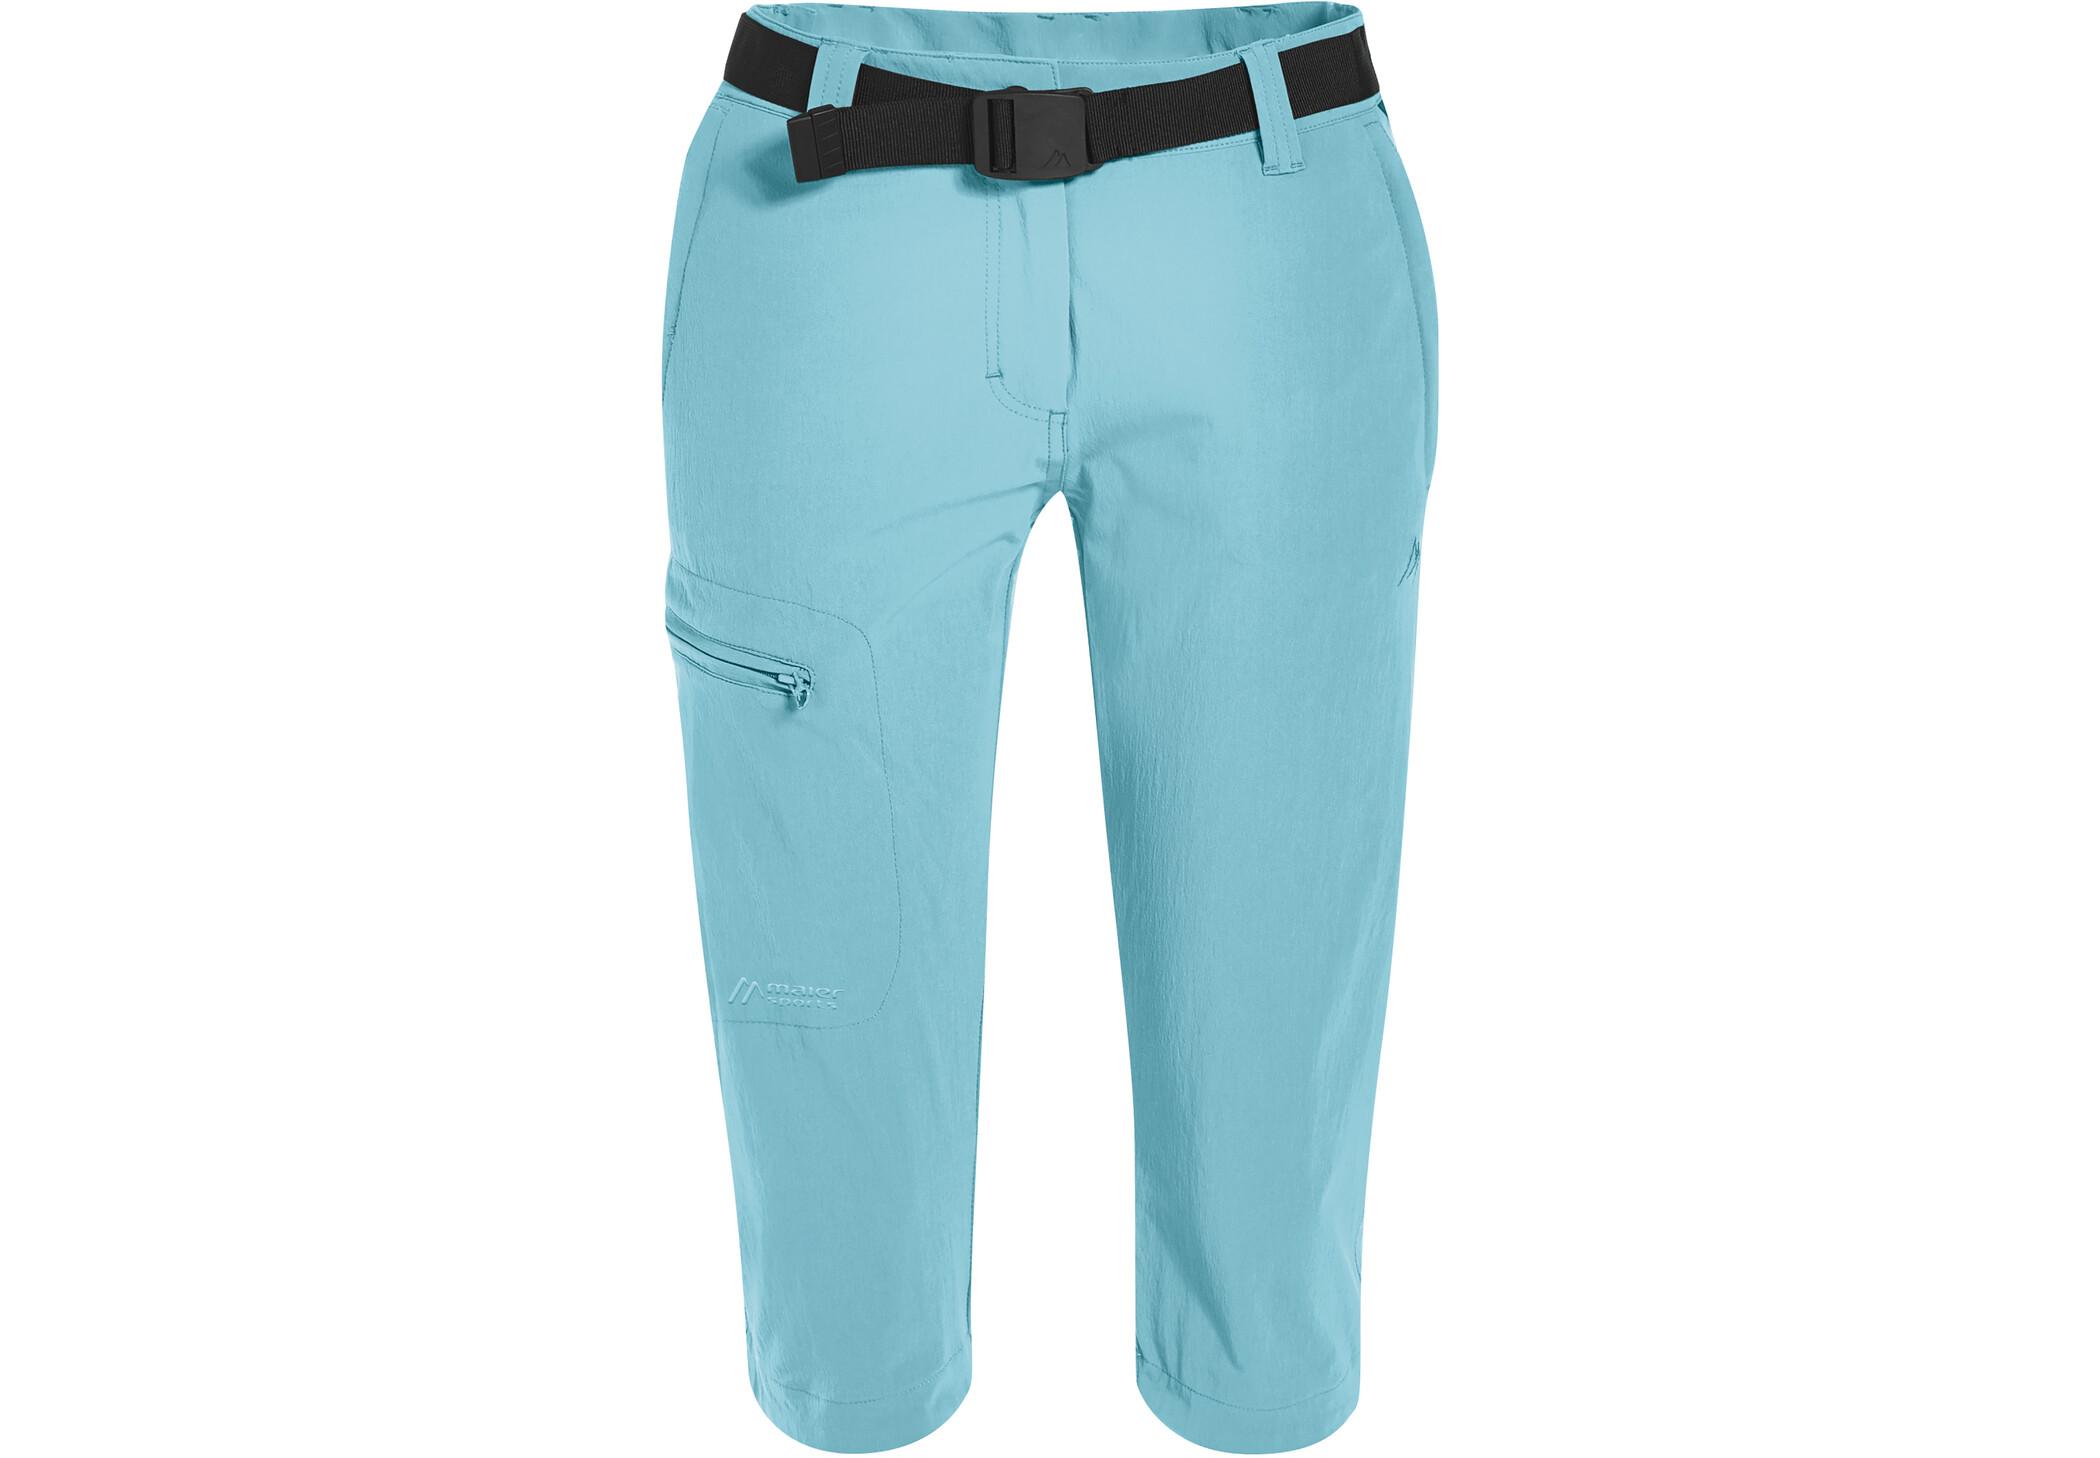 Pantalon Capri Pantalones 3 4 Rebajados Campz Es